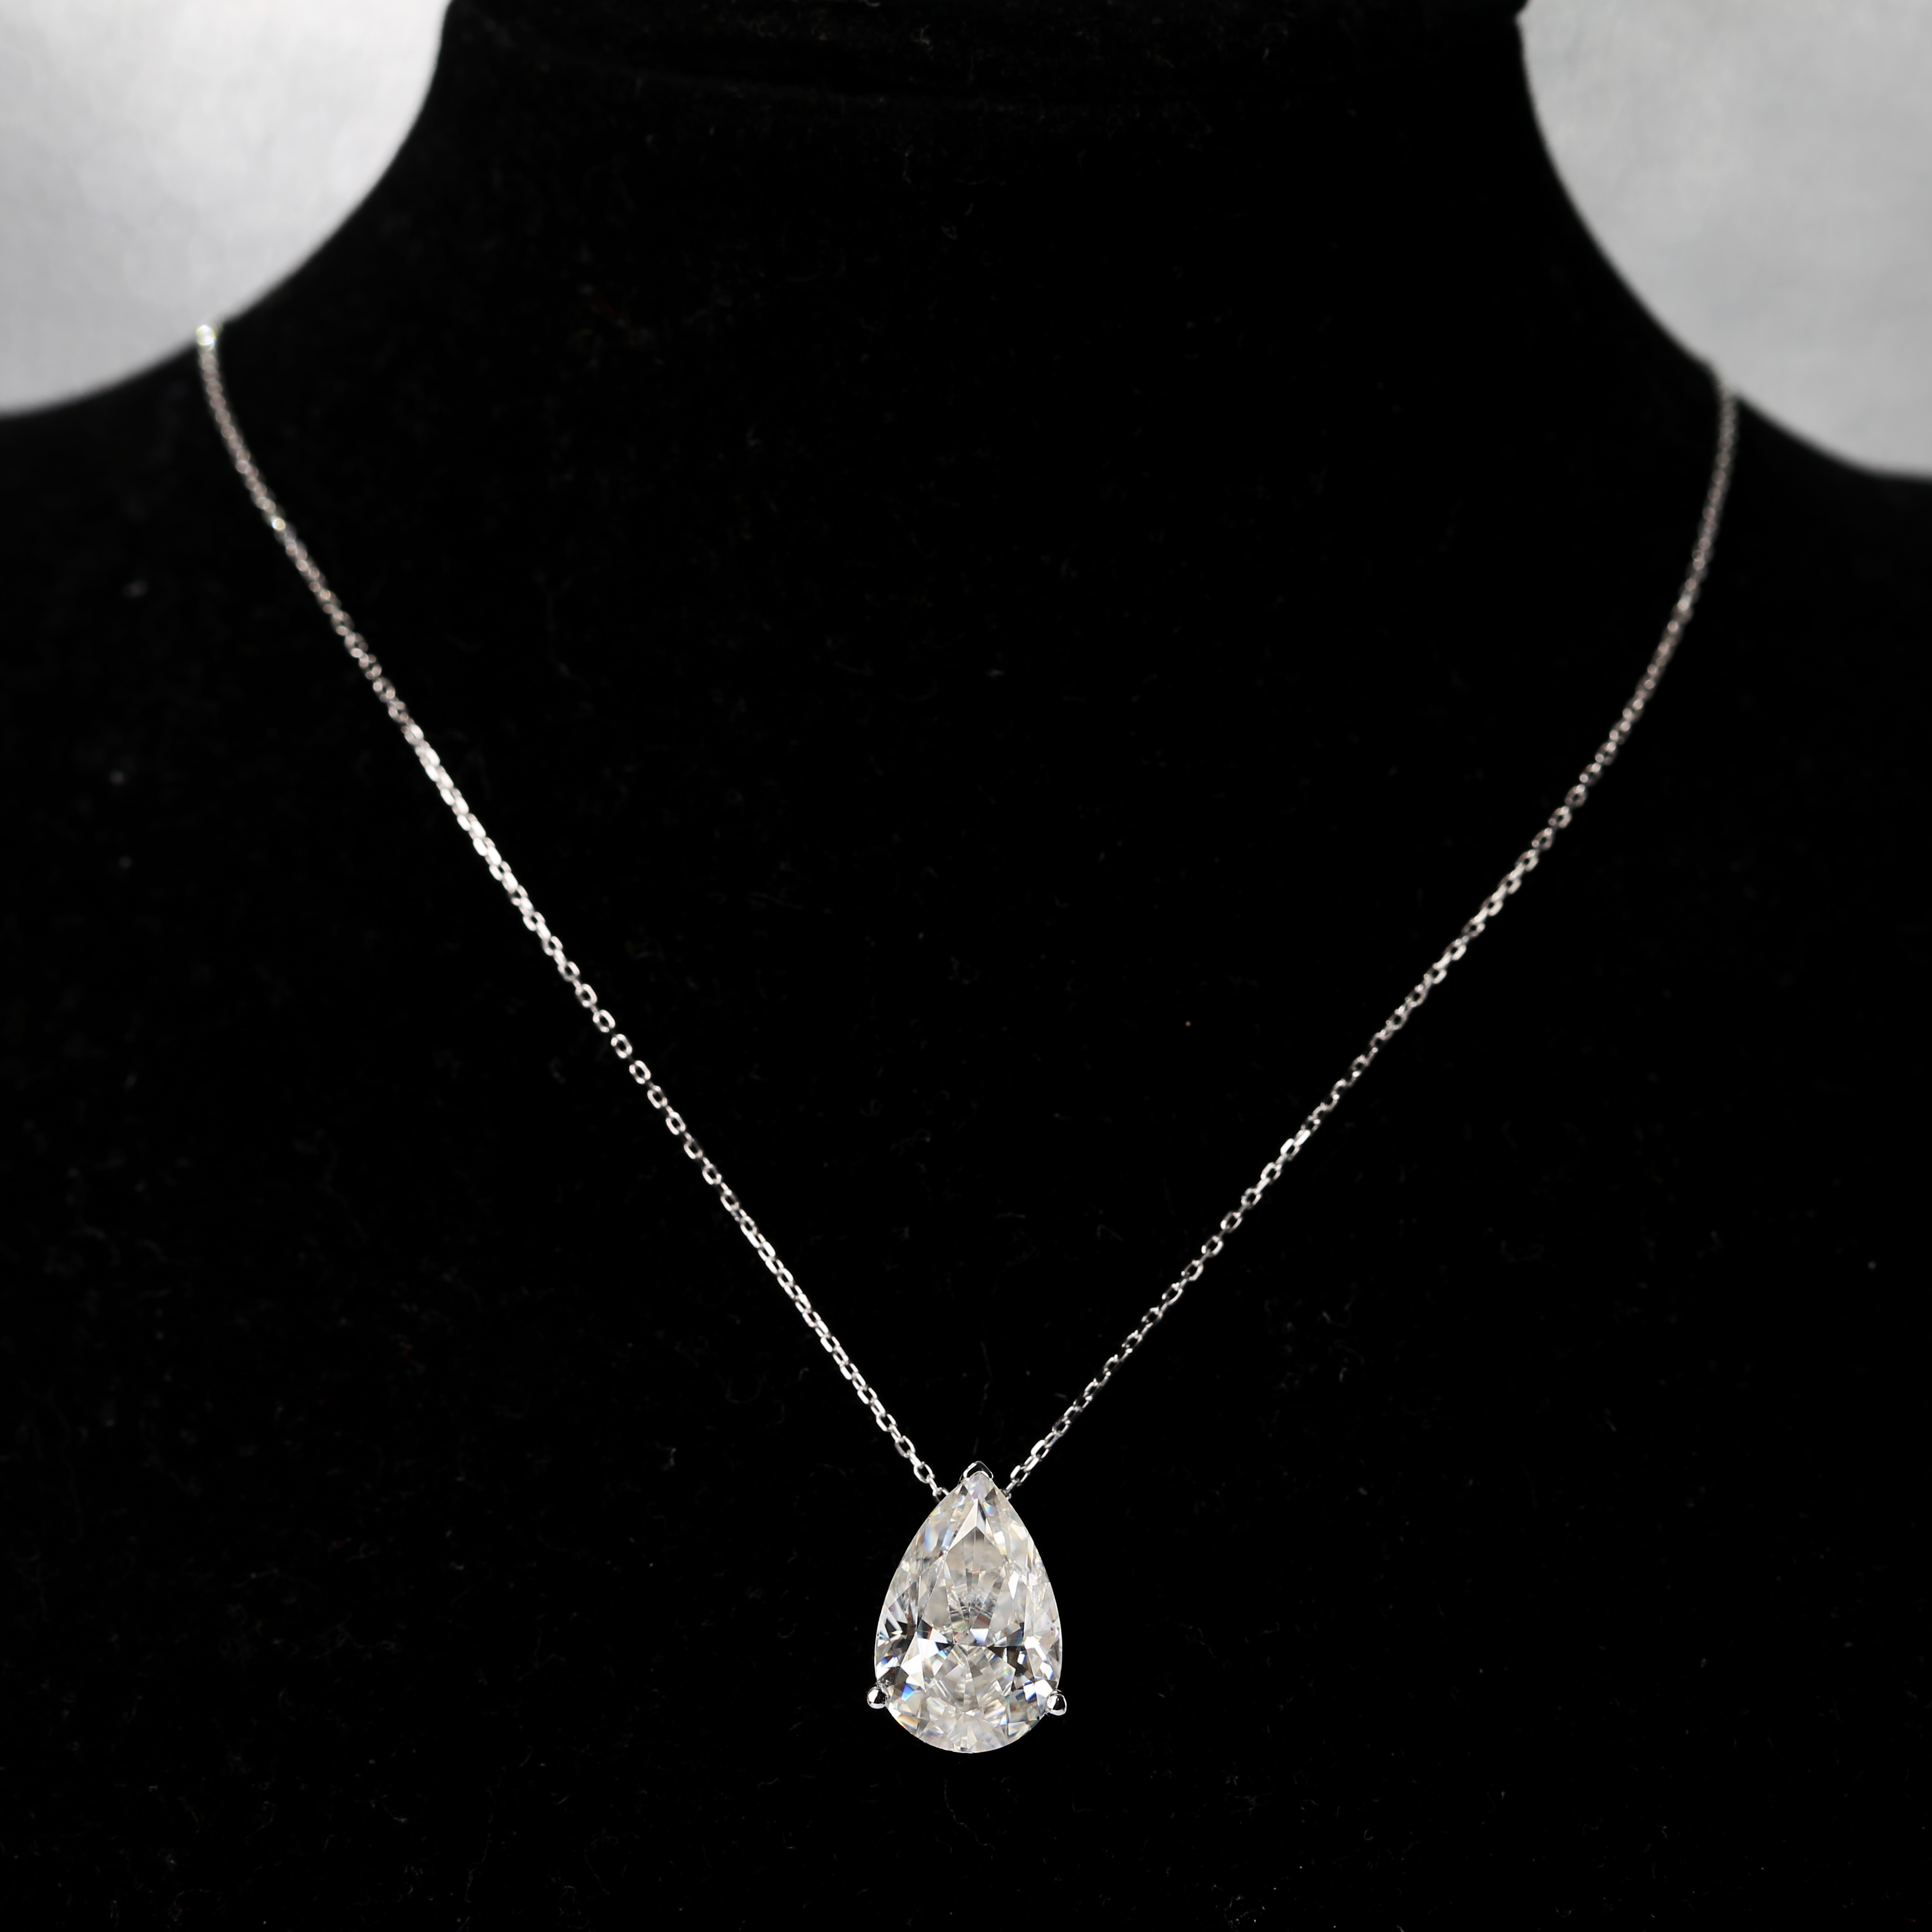 Solid 18K White Gold Moissanite Pendant 4.5ct 10x15mm DF Color Pear Cut Moissanite Lab Diamond Pendant Necklace For Women